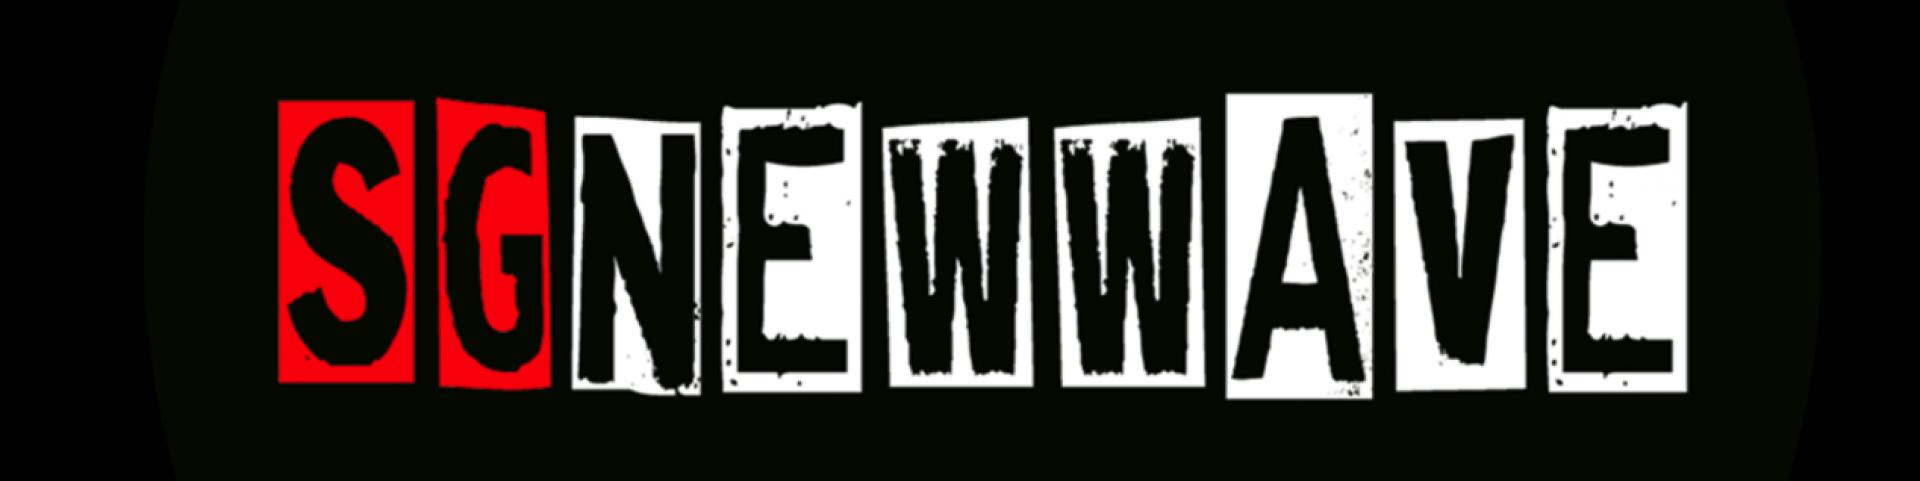 SGNewWave